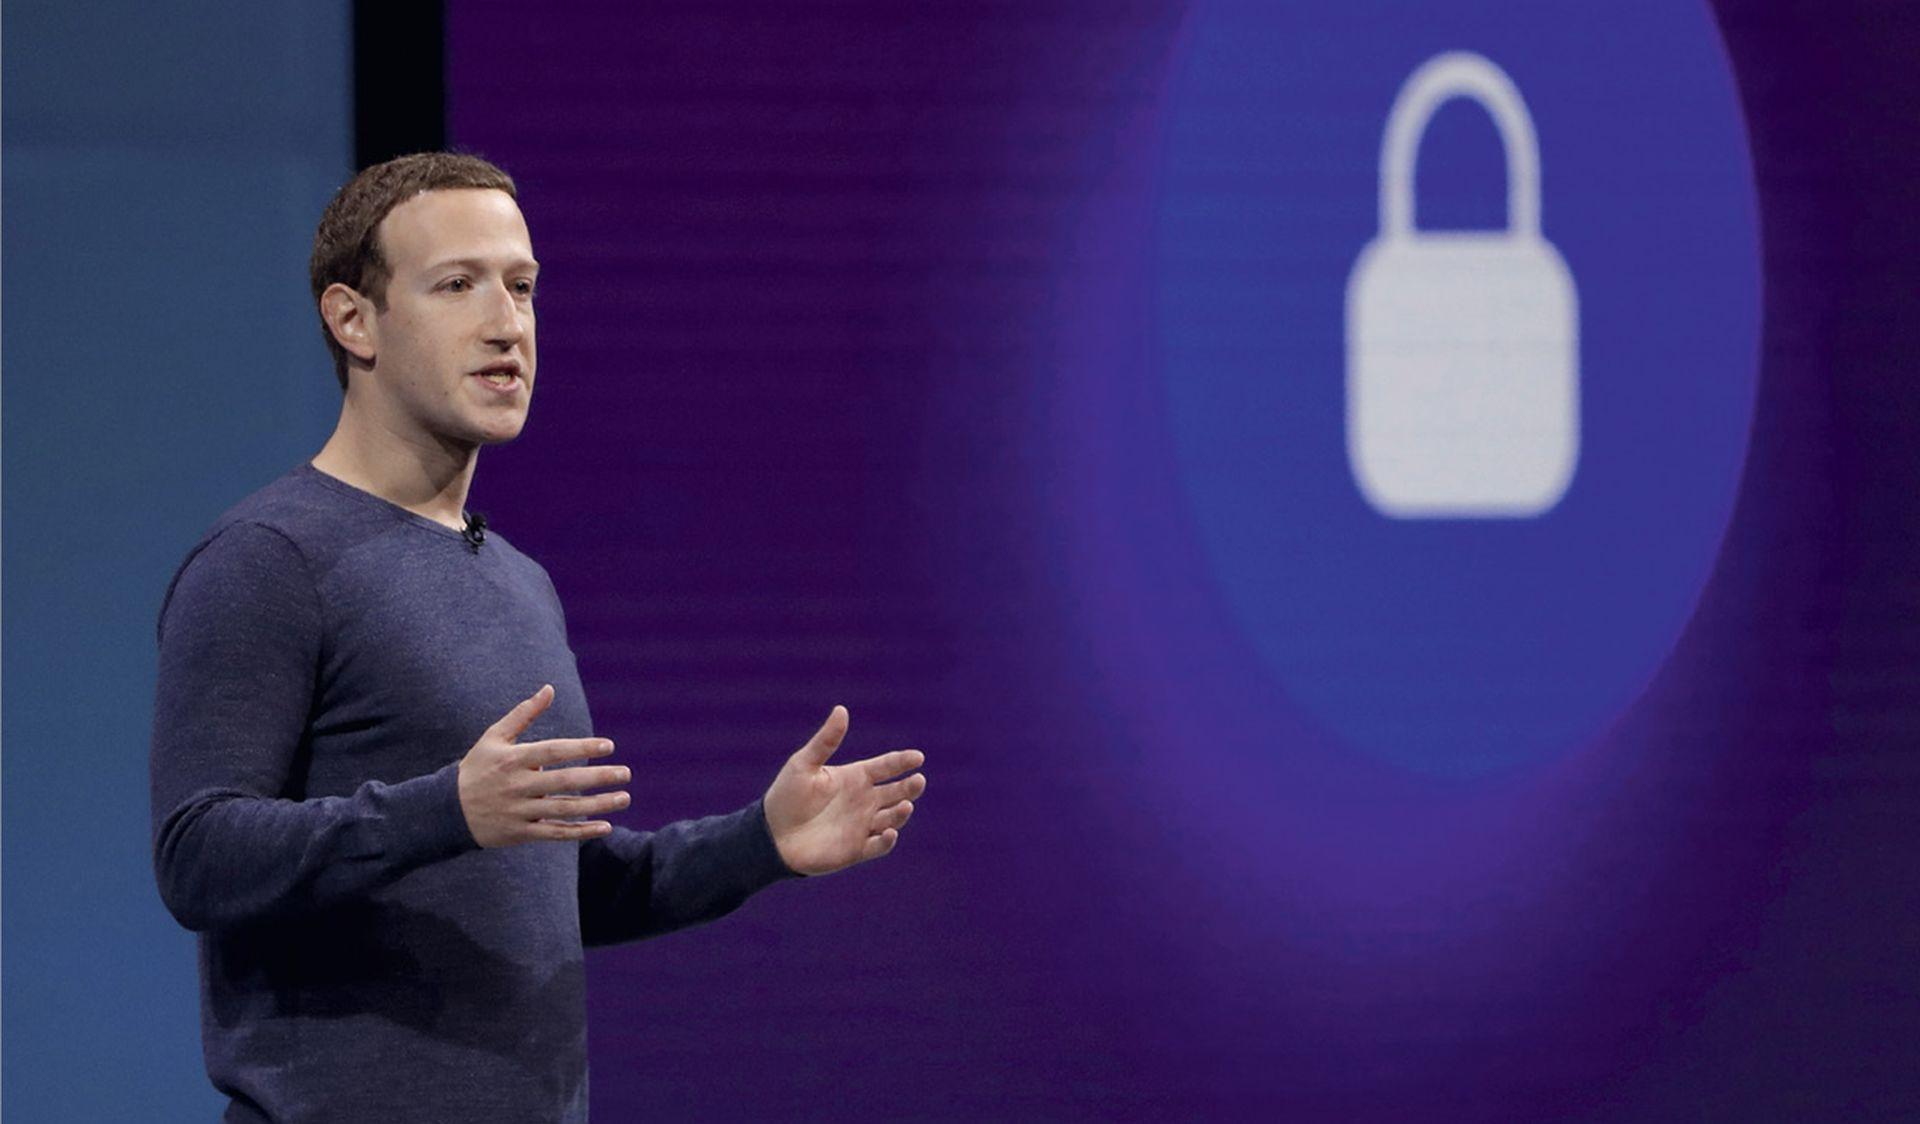 Veliki pad dionica samo je uvod u nove probleme Marka Zuckerberga